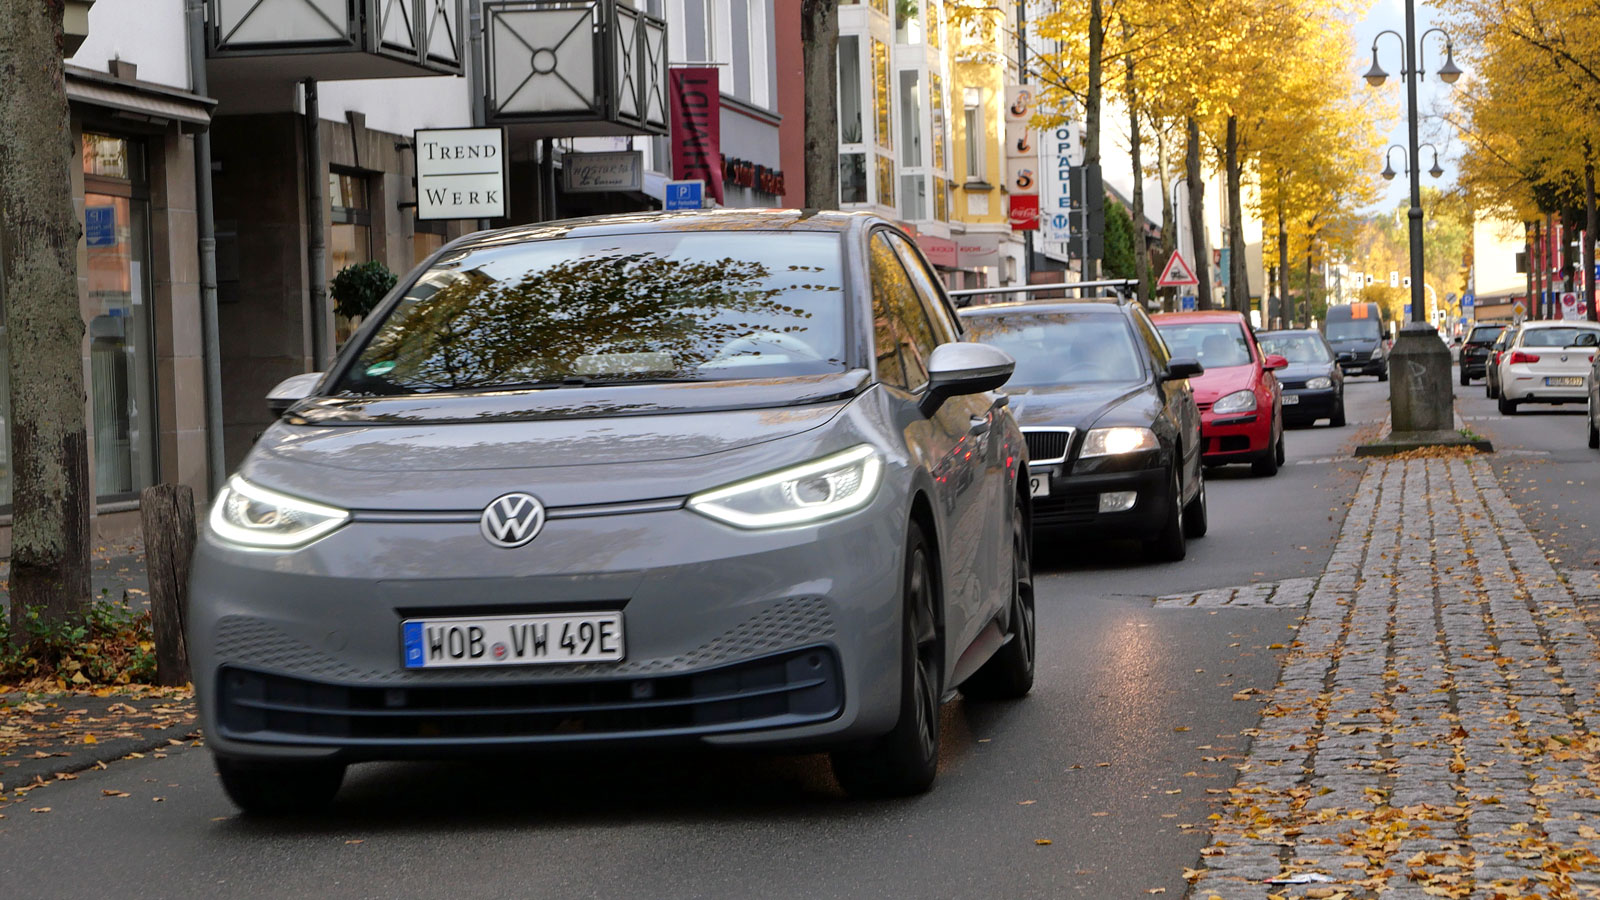 Continental-Studie-Interesse-am-E-Auto-steigt